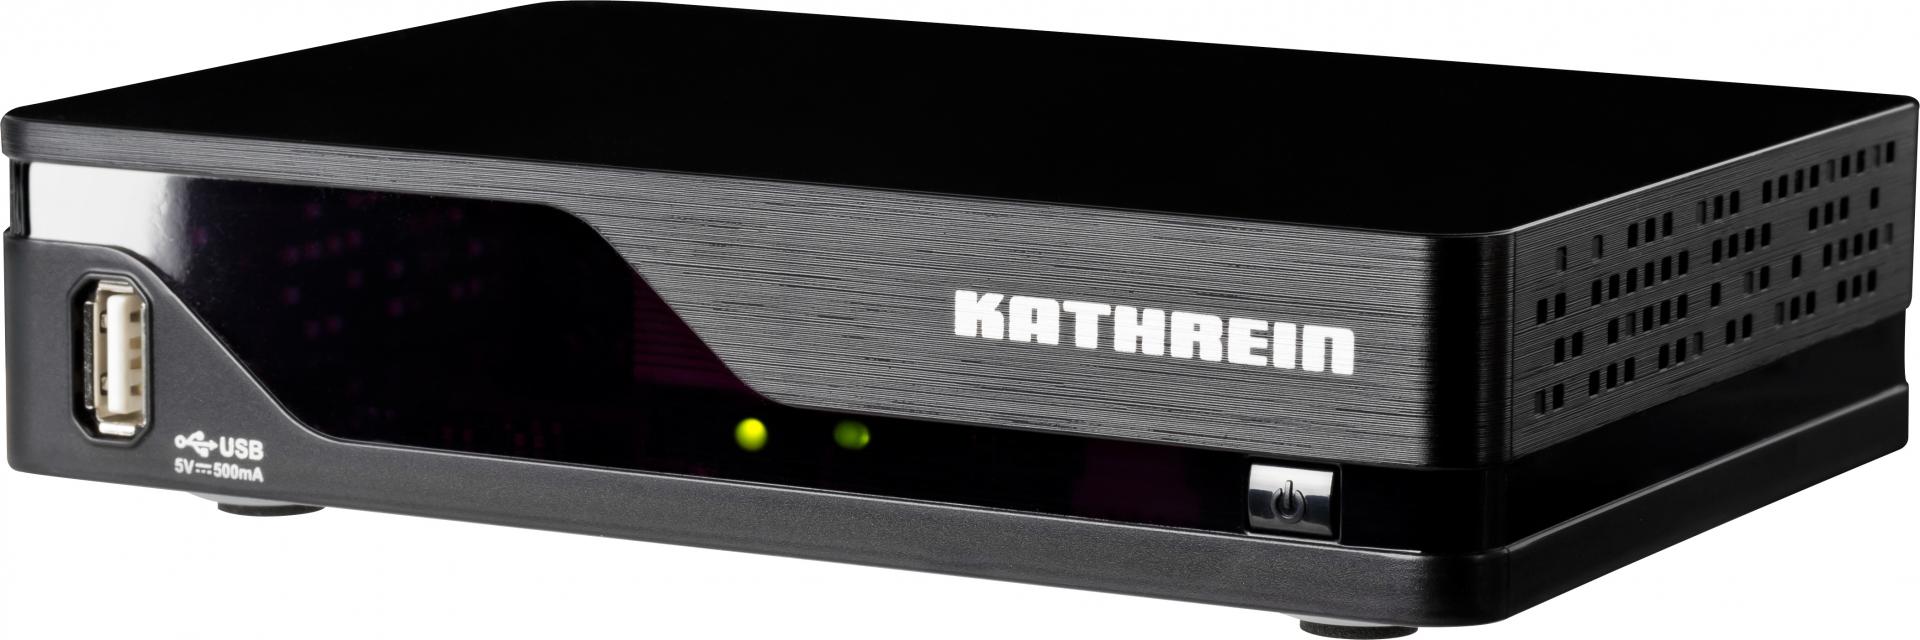 kathrein dvb t2 hd receiver uft 930sw camping fernseher. Black Bedroom Furniture Sets. Home Design Ideas